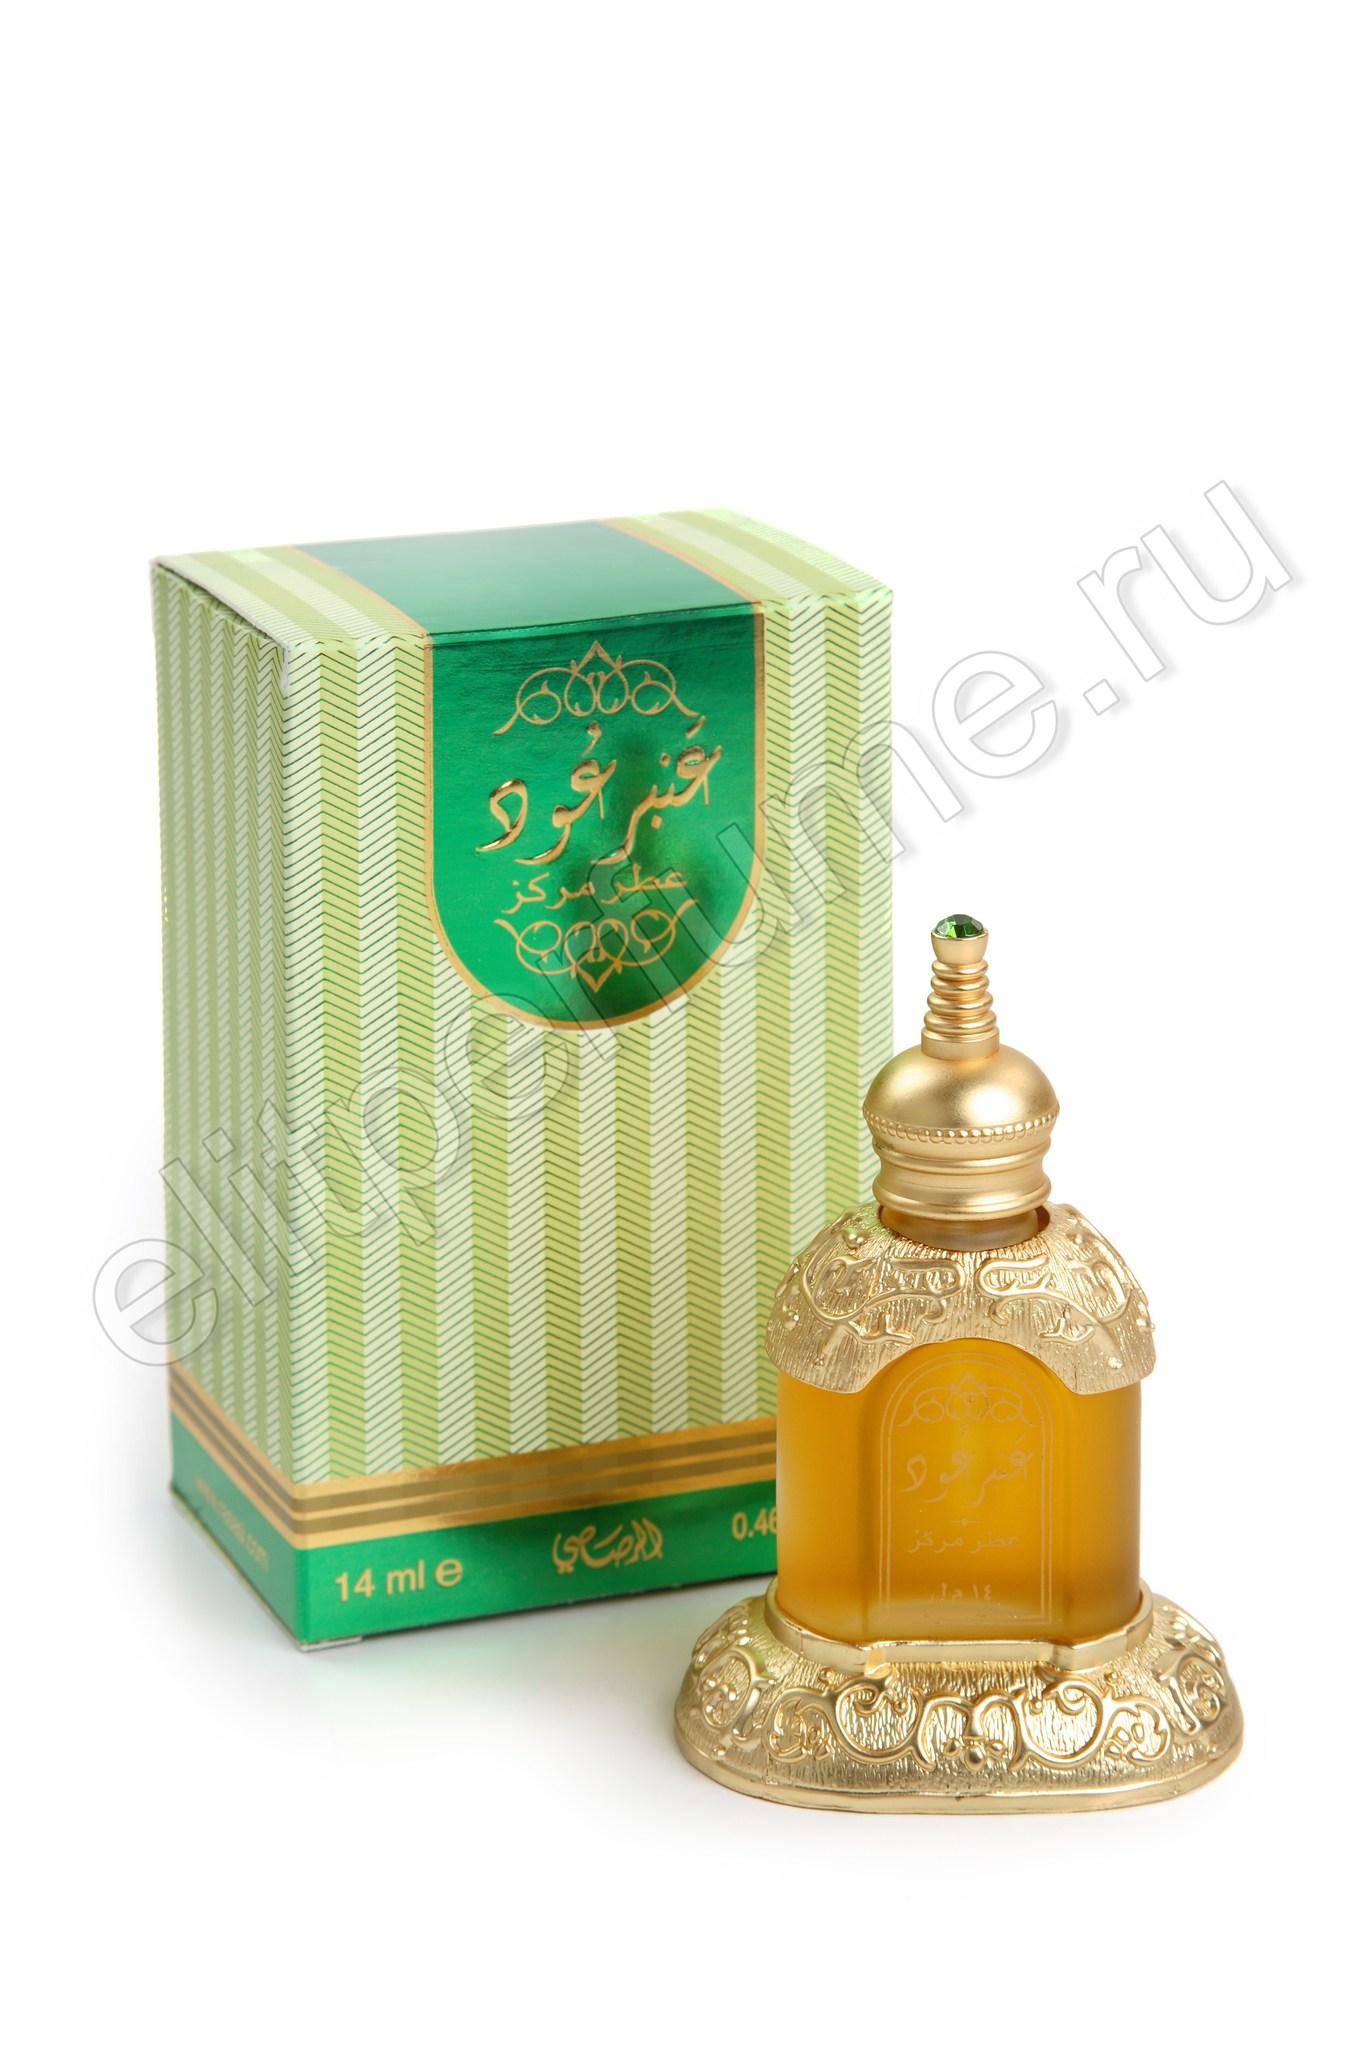 Уд Янтарь Amber Ood 14 мл арабские масляные духи от Расаси Rasasi Perfumes